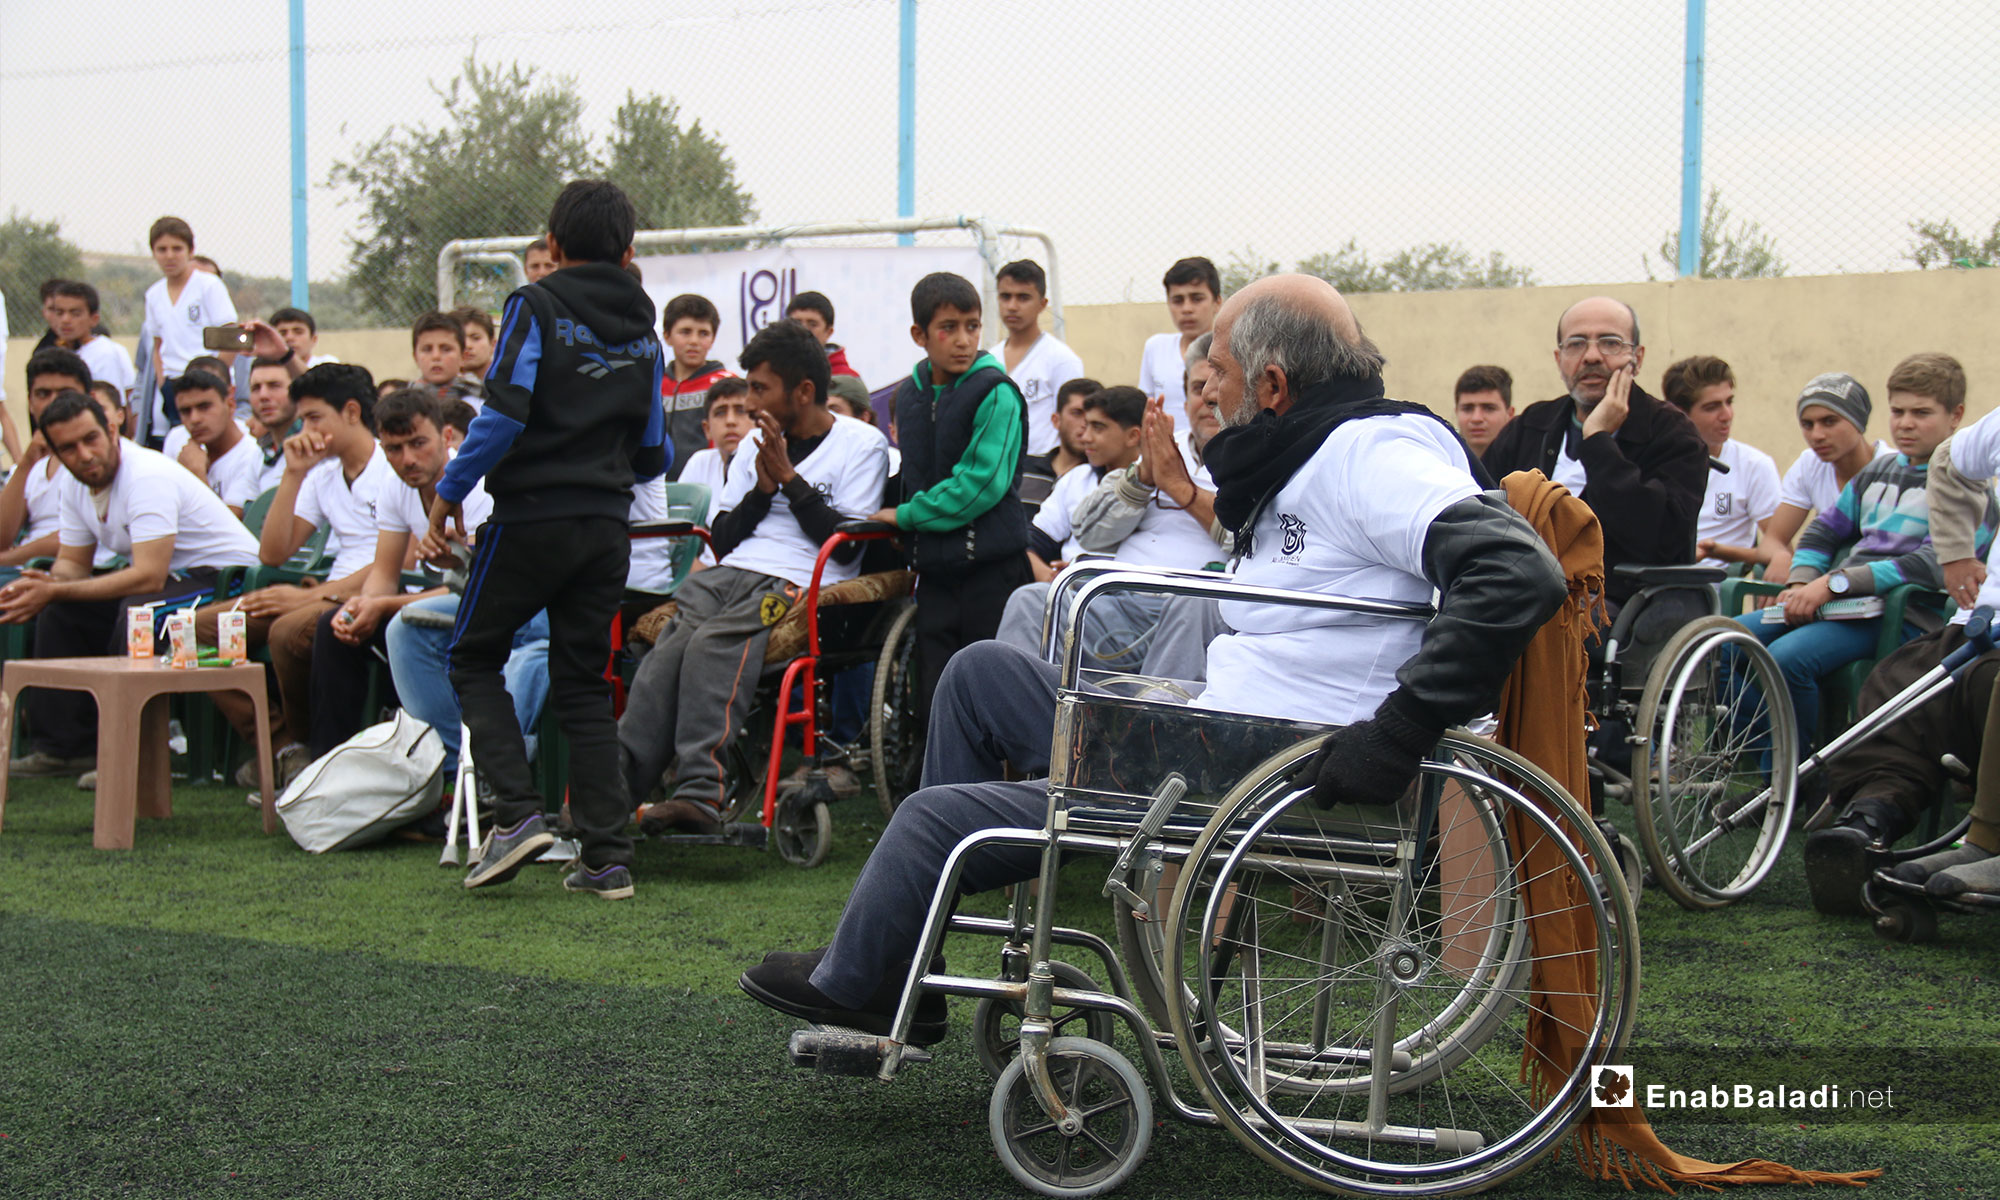 Marathon for people with disabilities and students in rural Idlib – November 22, 2018 (Enab Baladi)